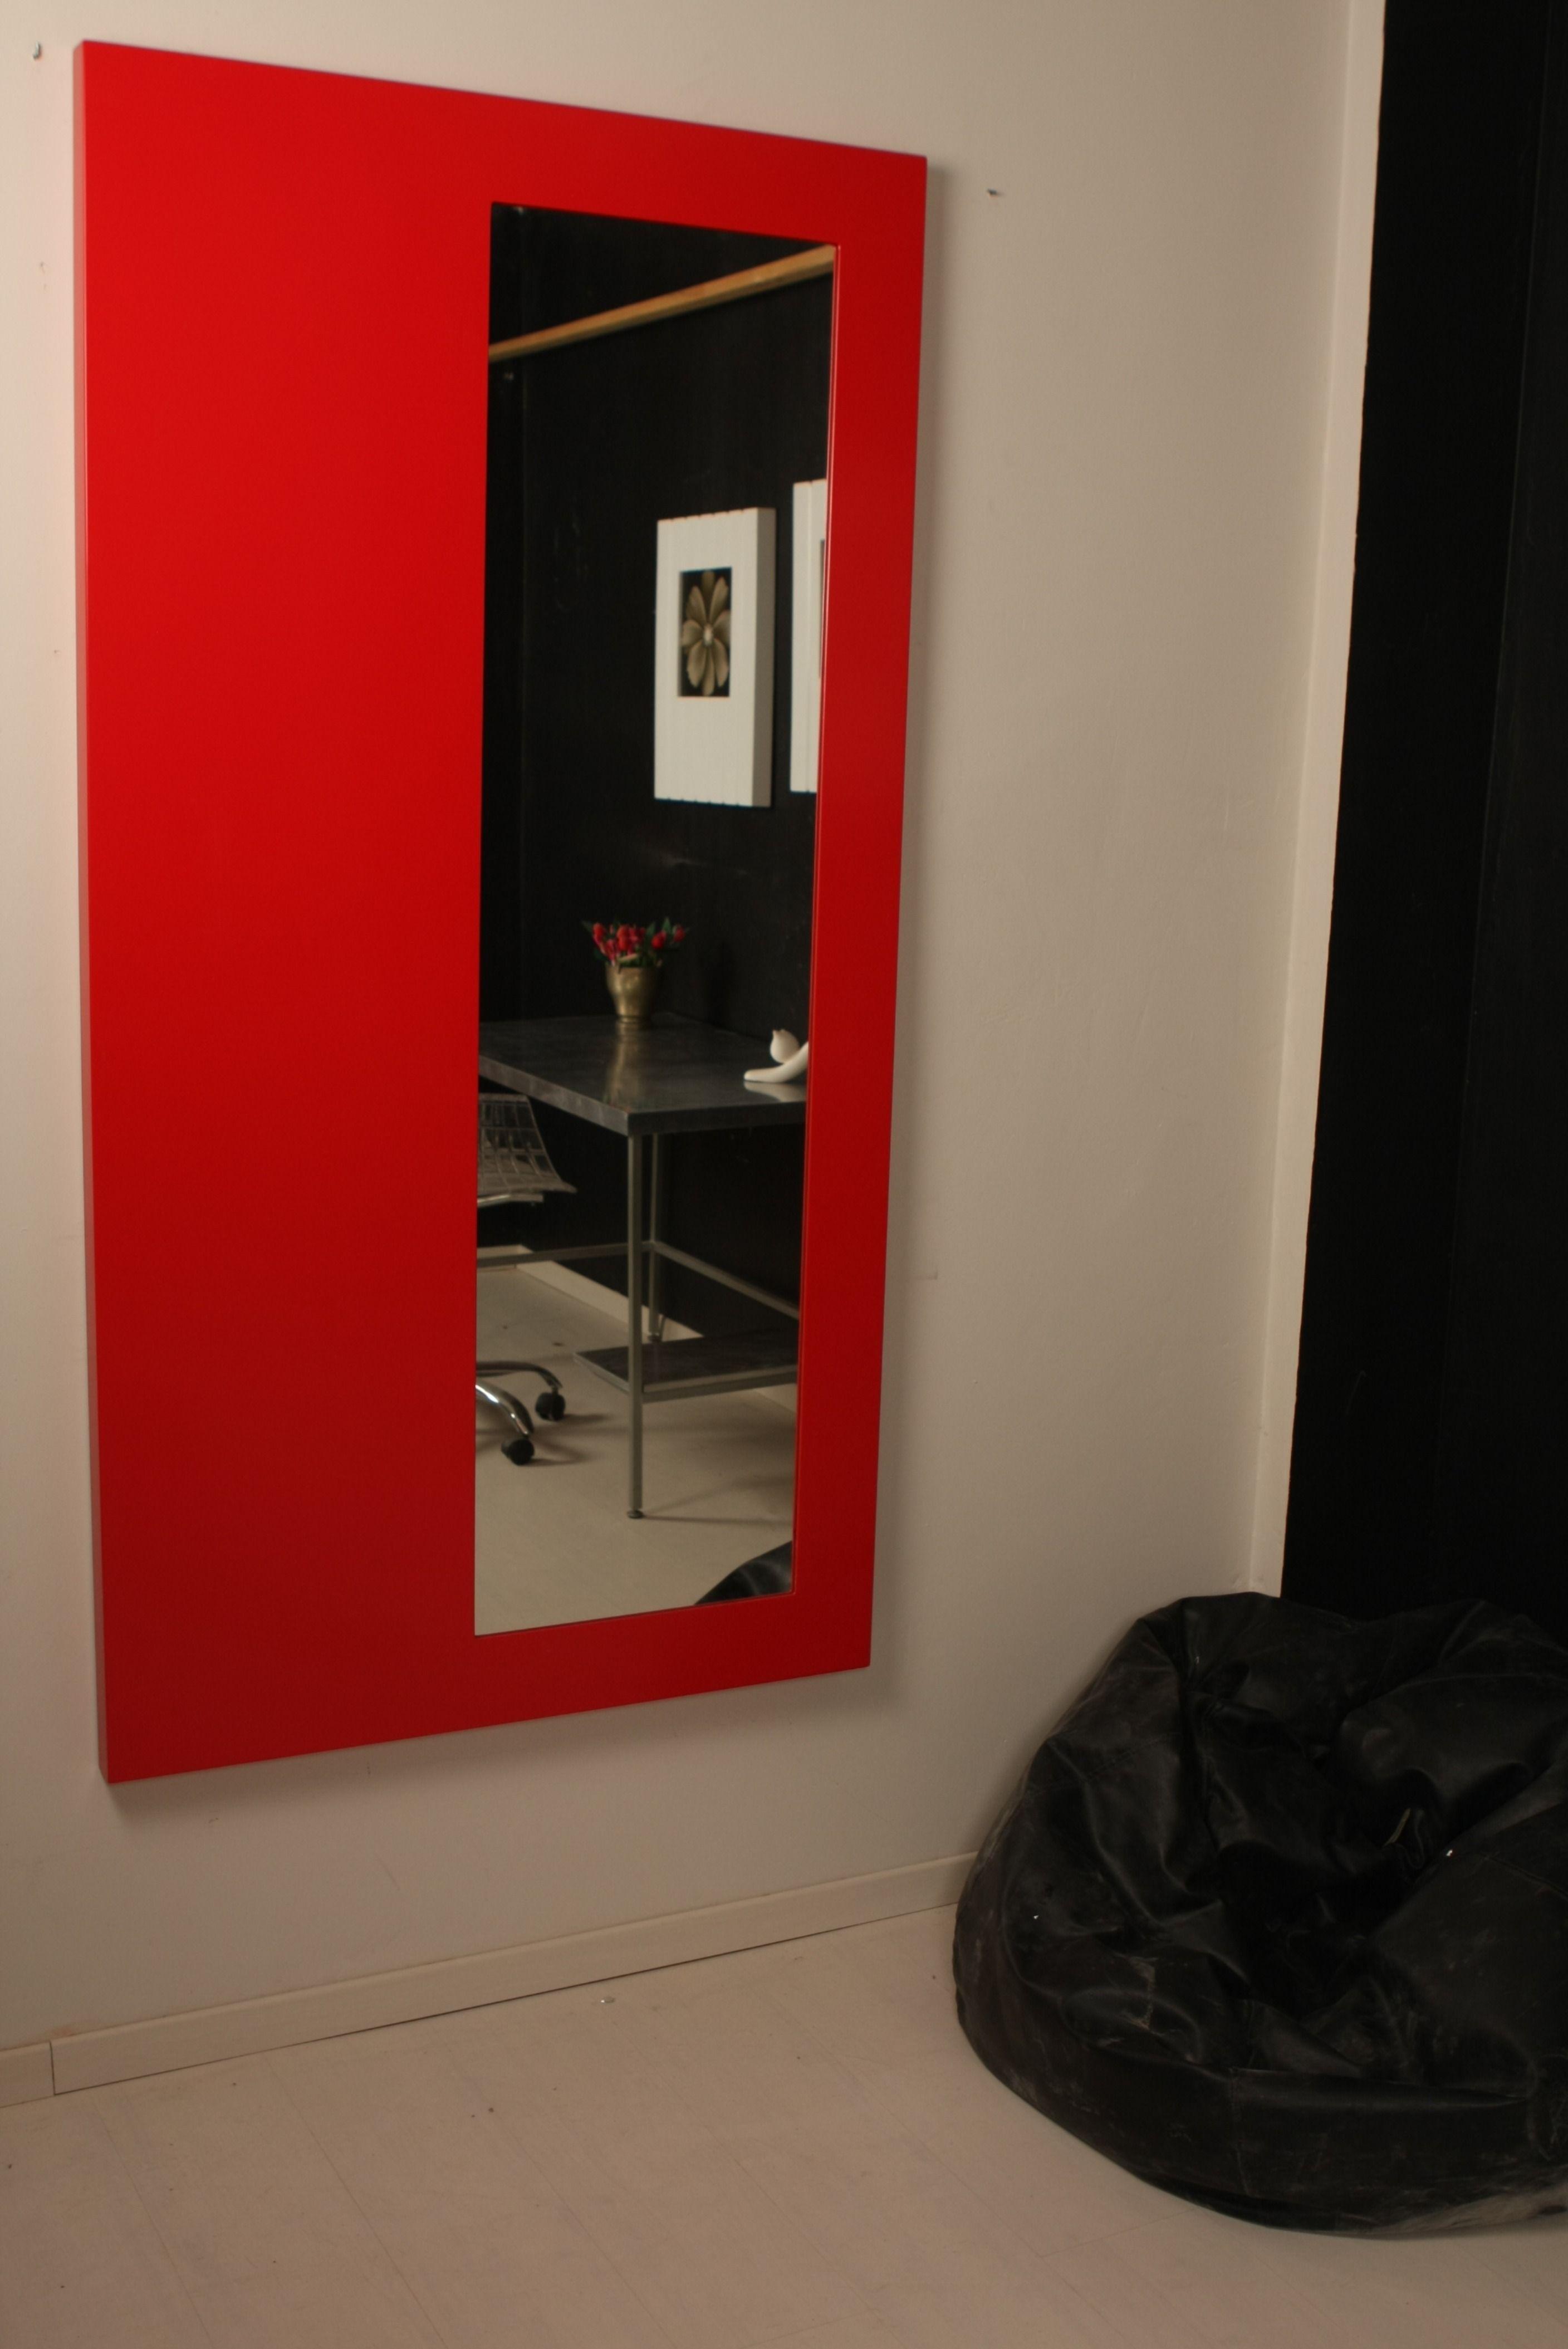 MERIGLARE Espejo De Afeitado De Ba/ño Giratorio Montado En La Pared Maquillaje 3X Aumento Individual 6 Pulgadas